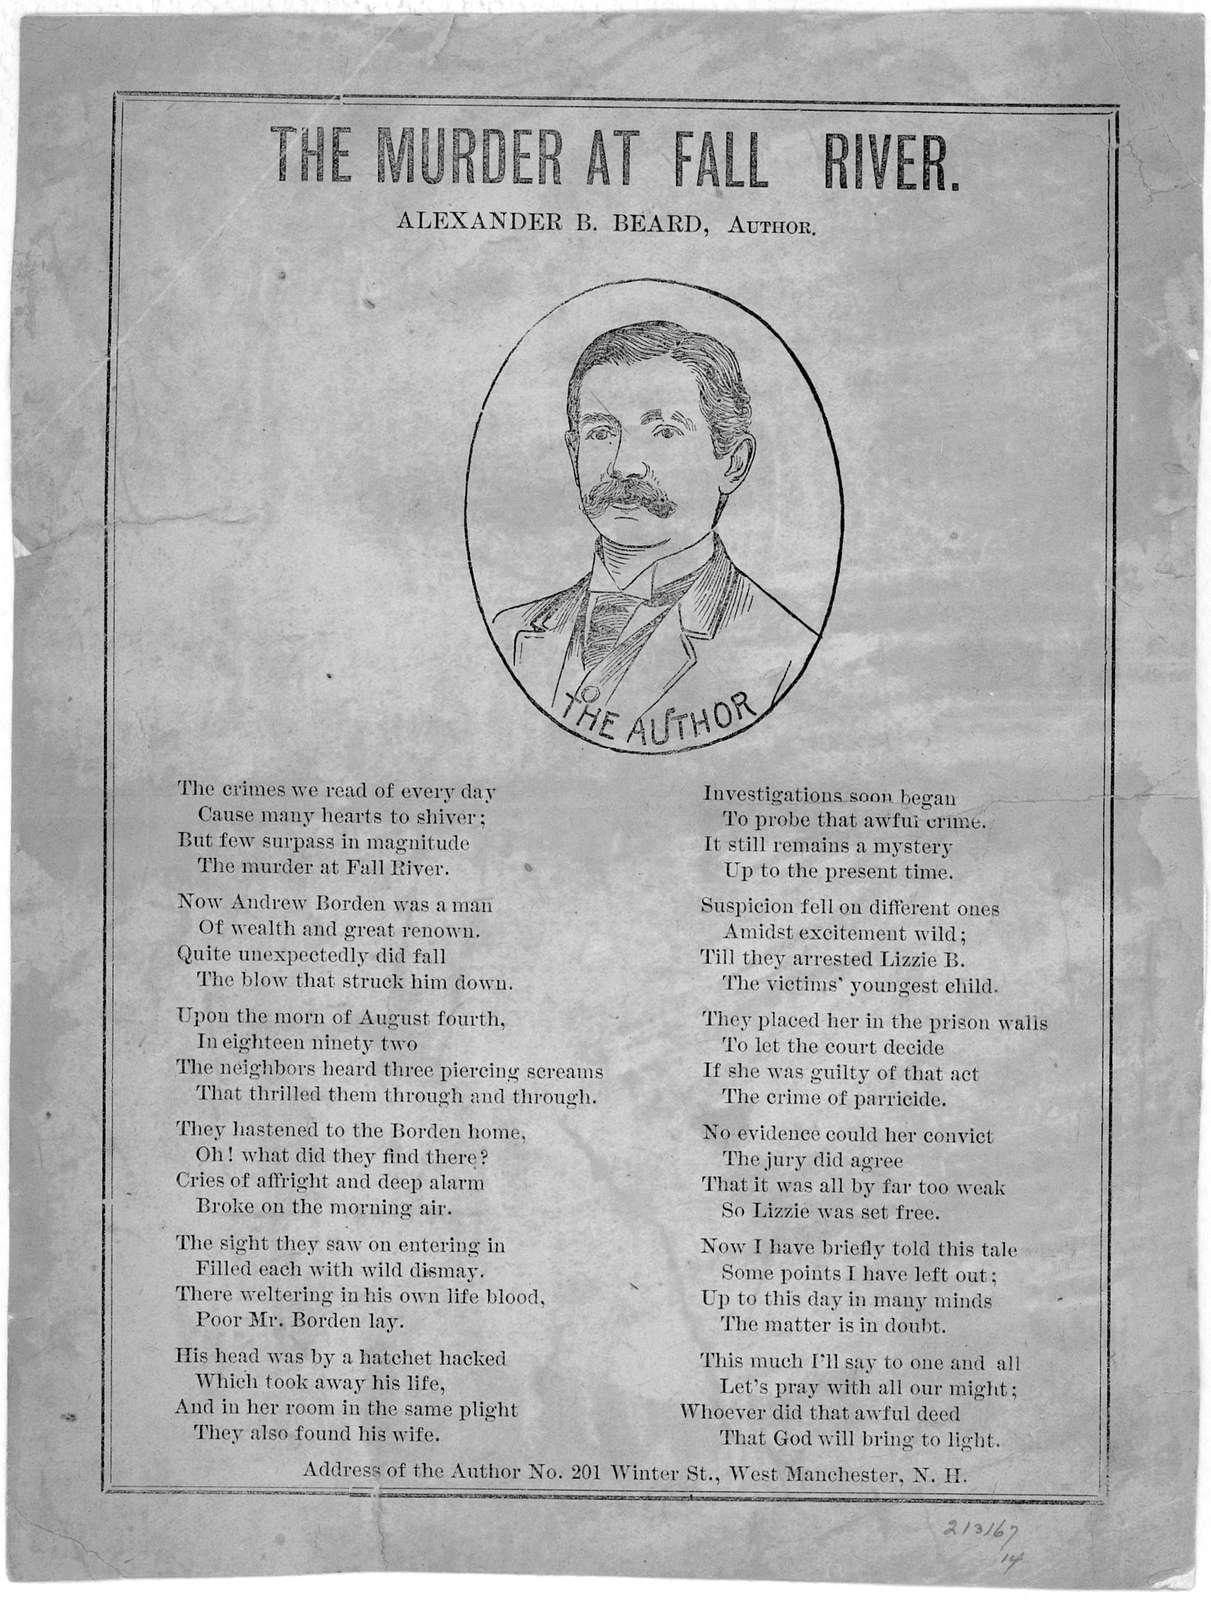 The murder at Fall River. Alexander B. Beard, author. West Manchester. N. H. [18--?].